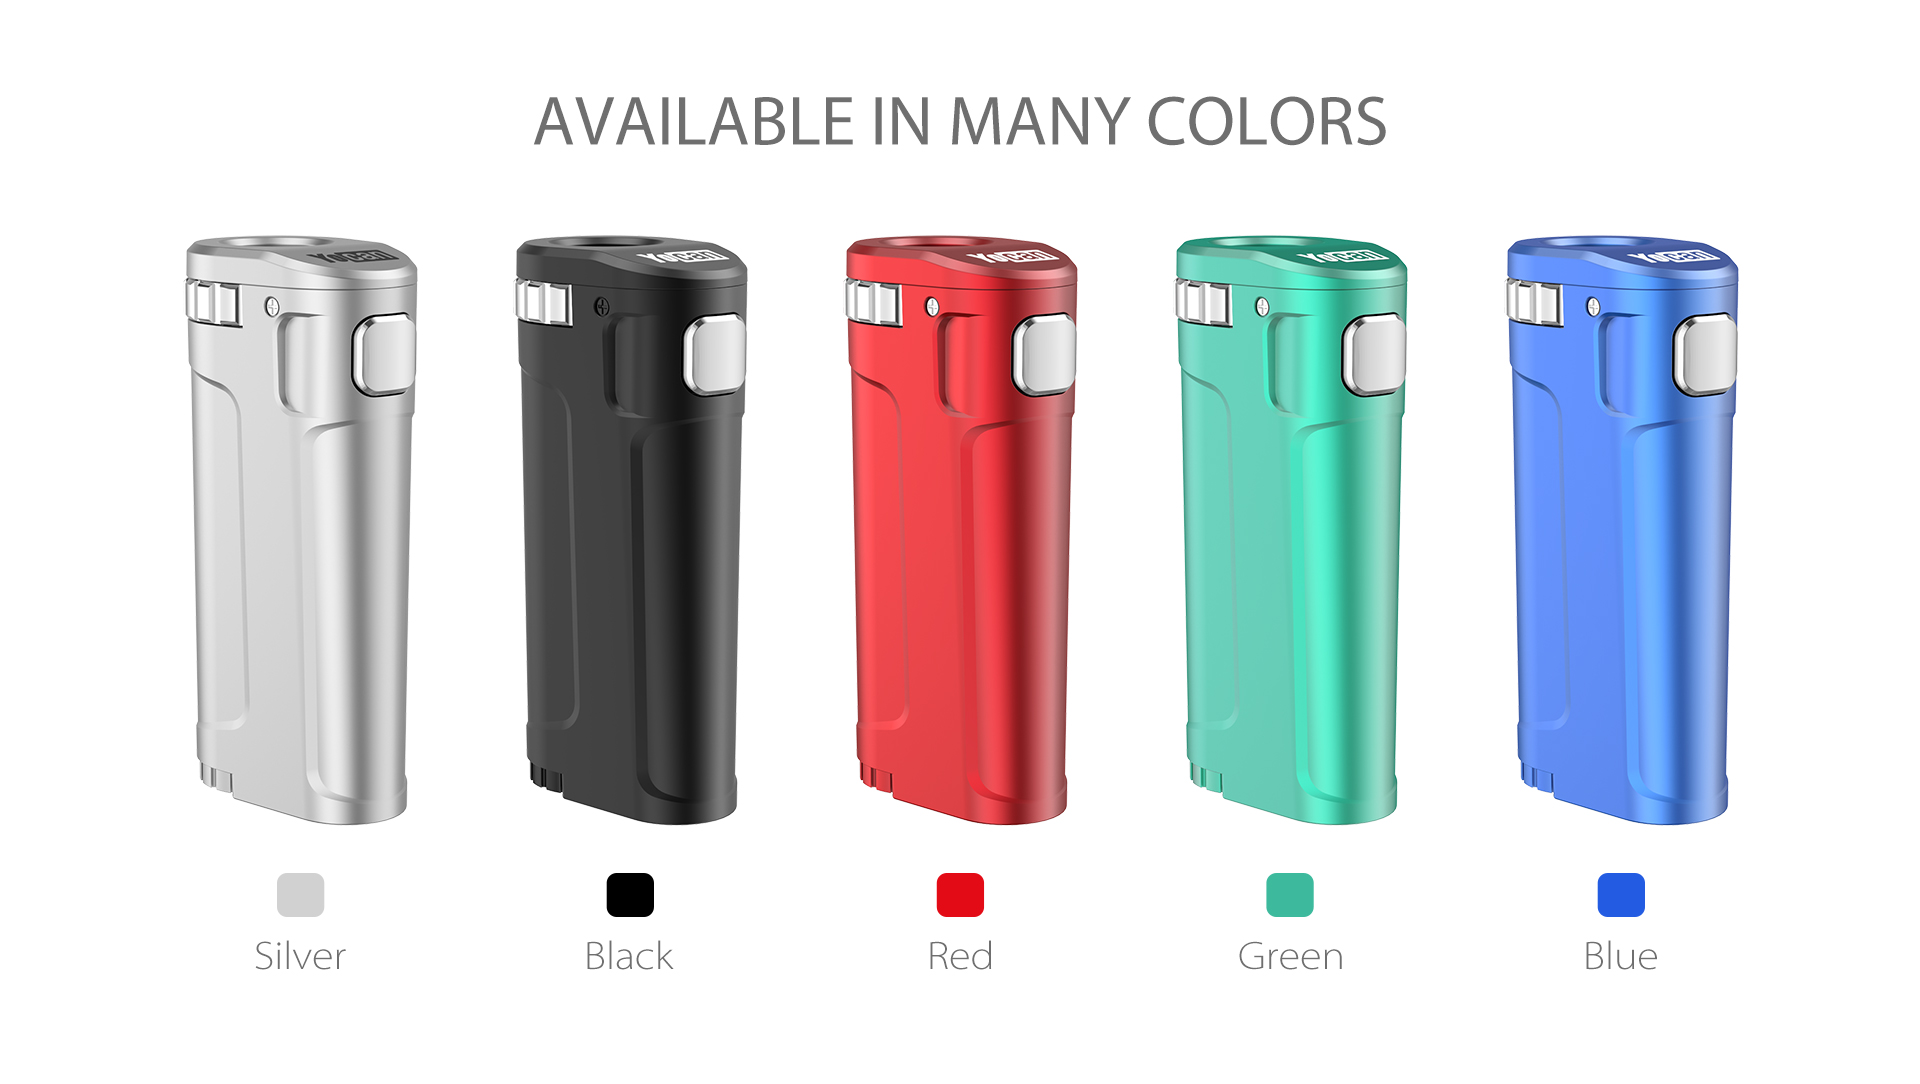 Yocan UNI Twist Universal Portable Mod comes with 5 stylish colors.